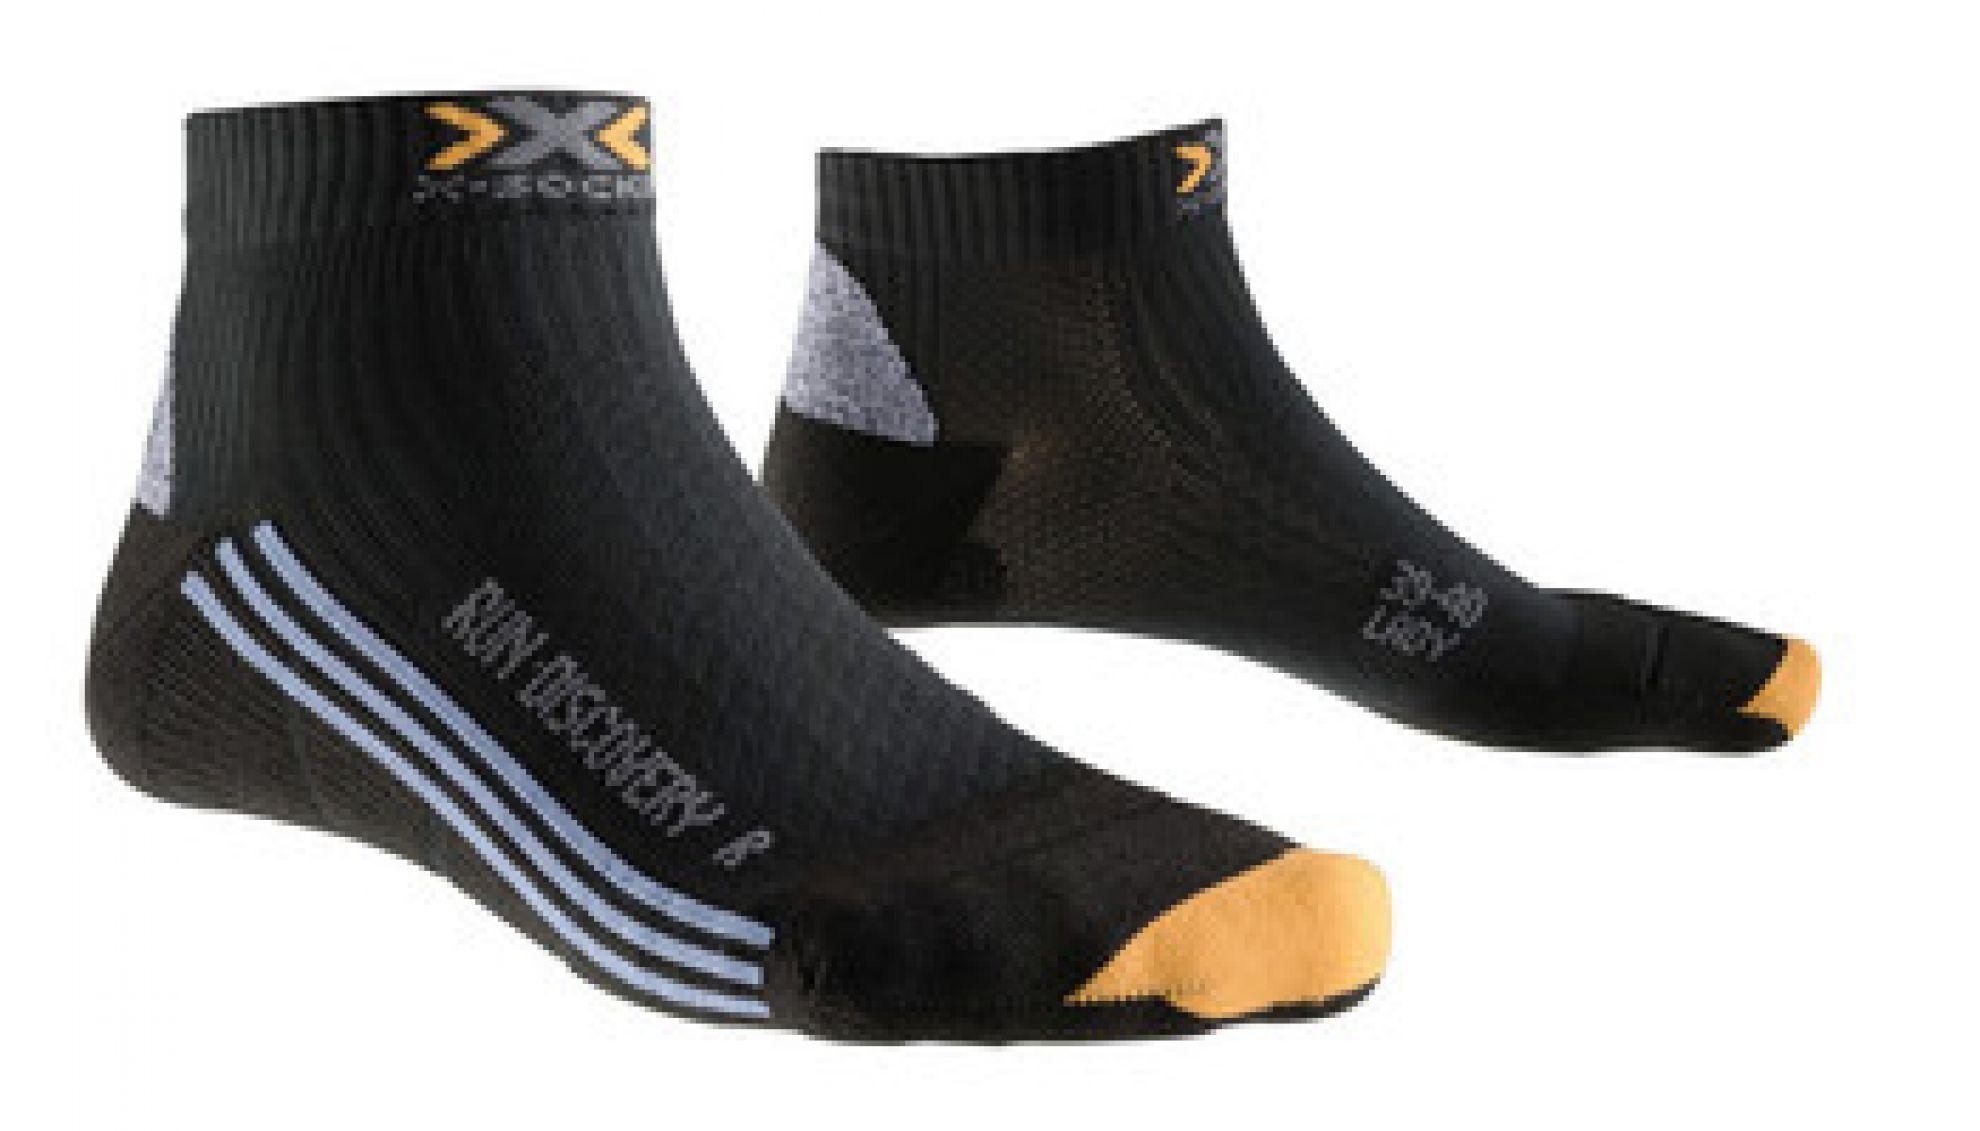 Run Discovery (X-Socks)